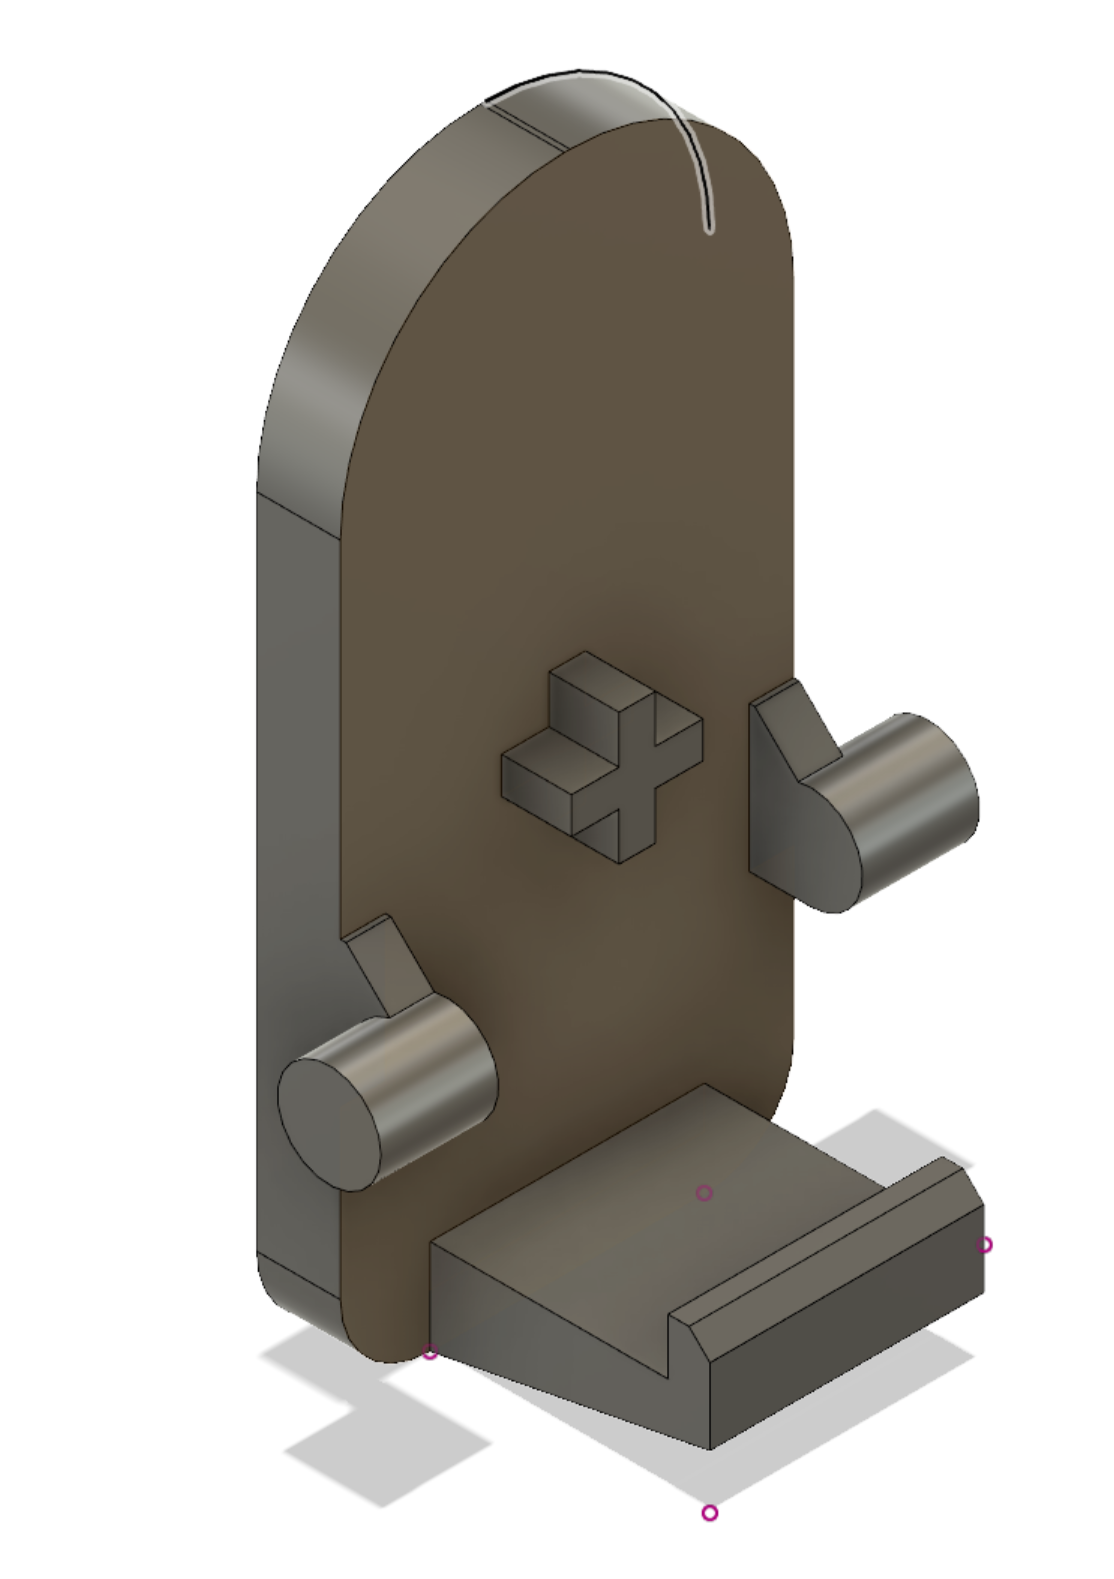 Hoover Quick stick vacuum bin clip